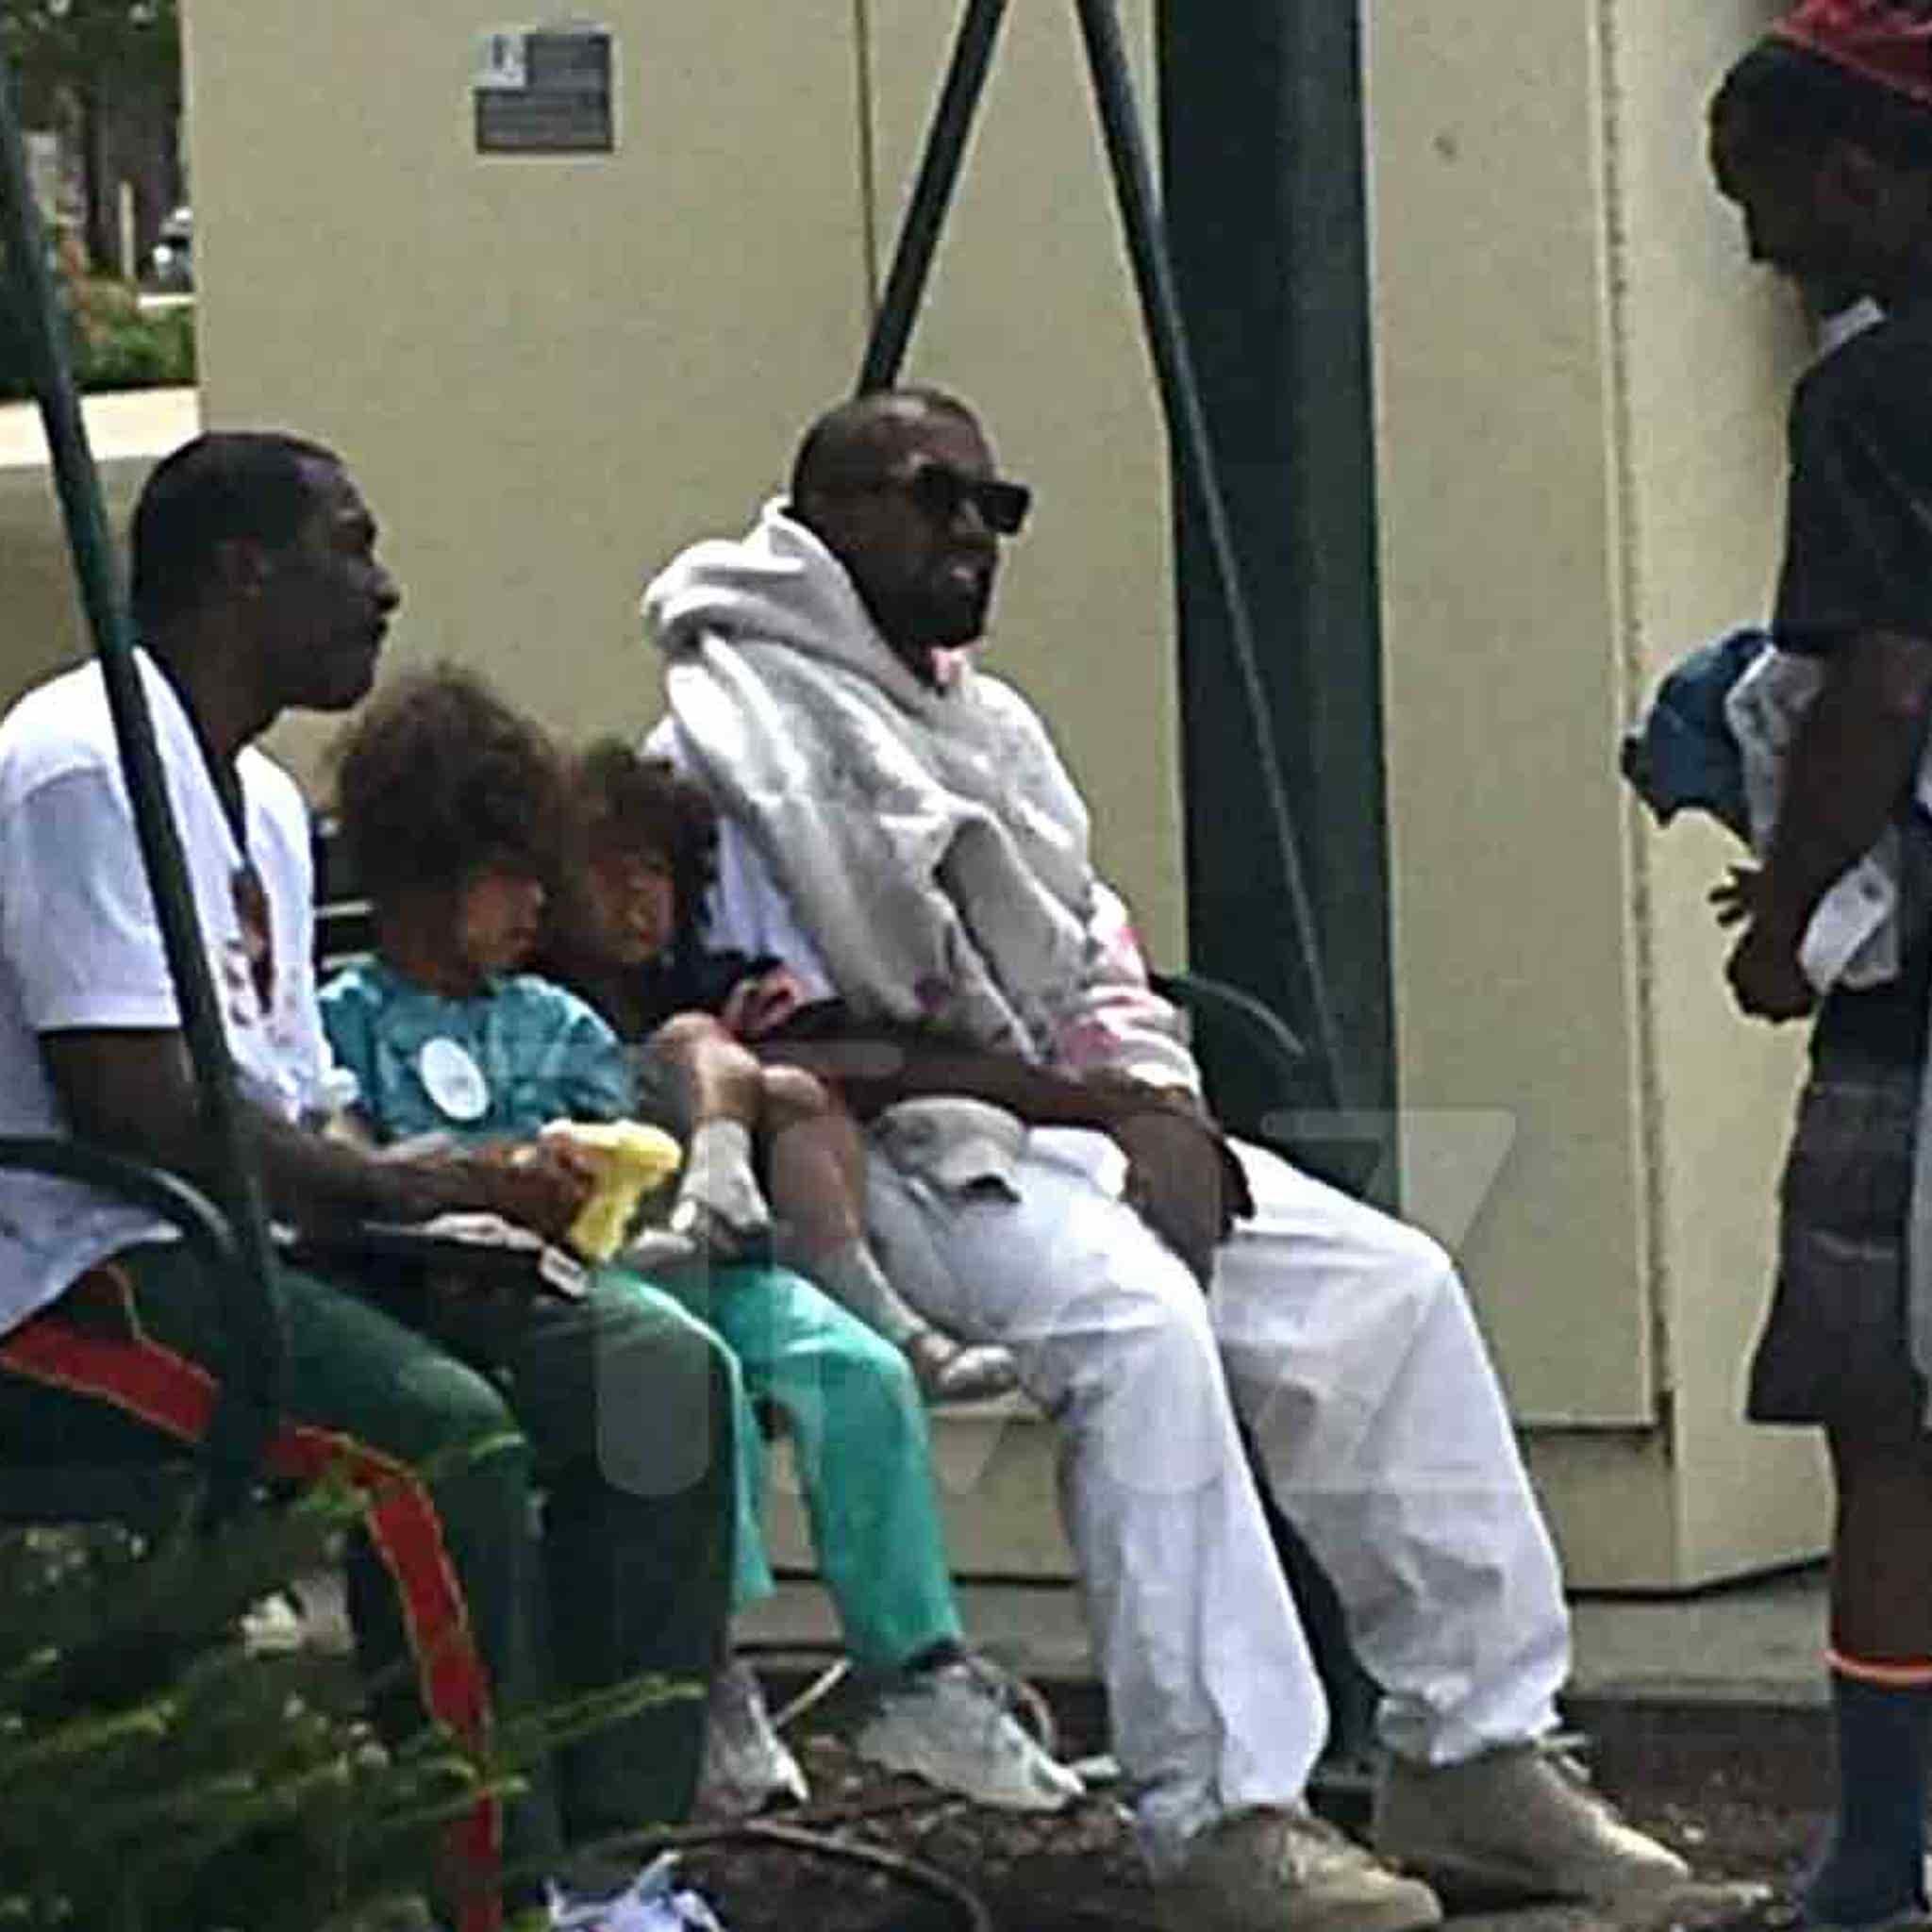 Kanye West in Dayton Ohio For Possible Sunday Service